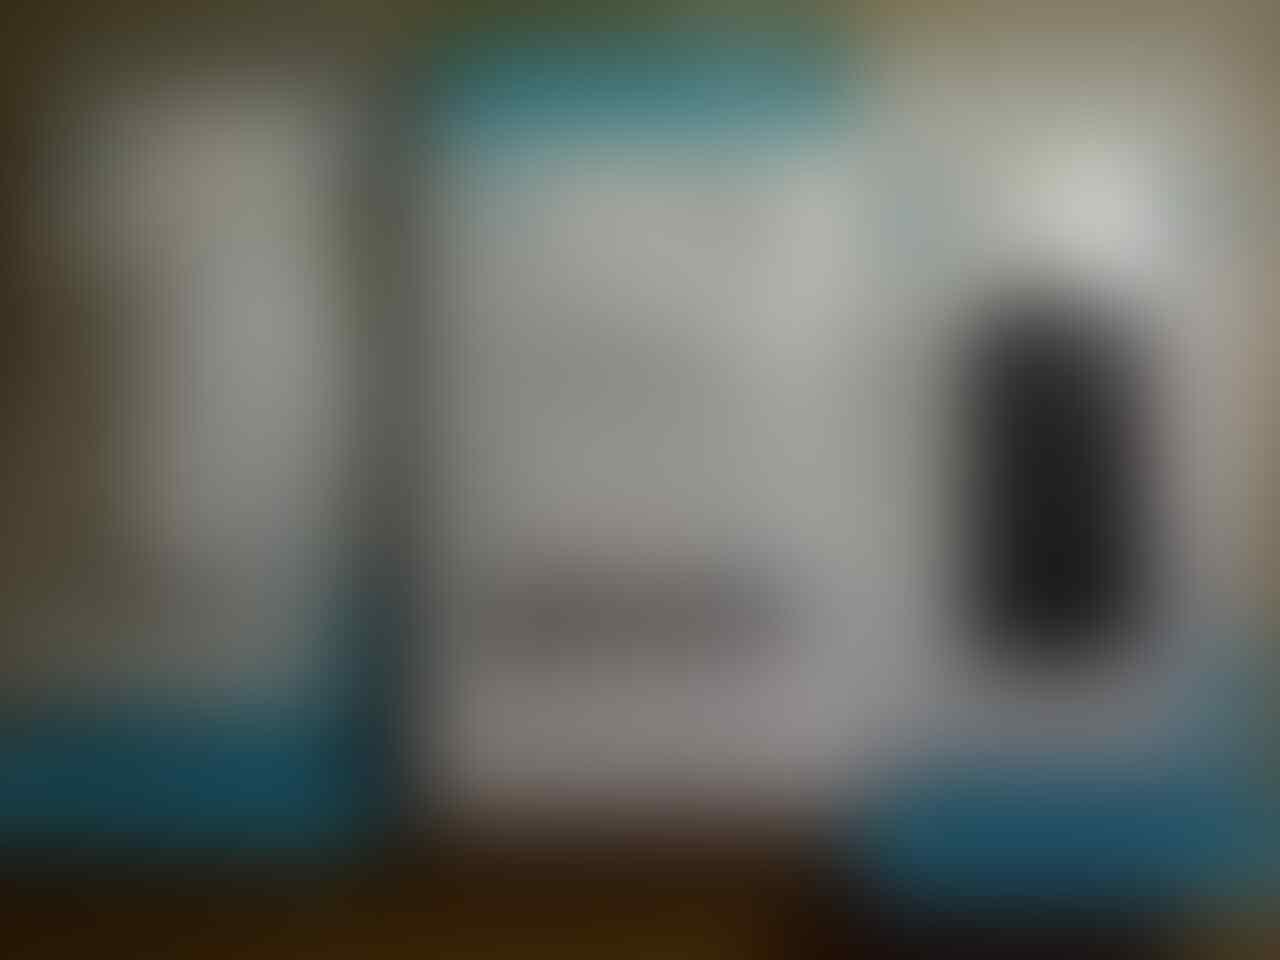 Power Bank - Portable - Aki Baterei Cadangan buat BB HP iPod iPhone Samsung PSP dll